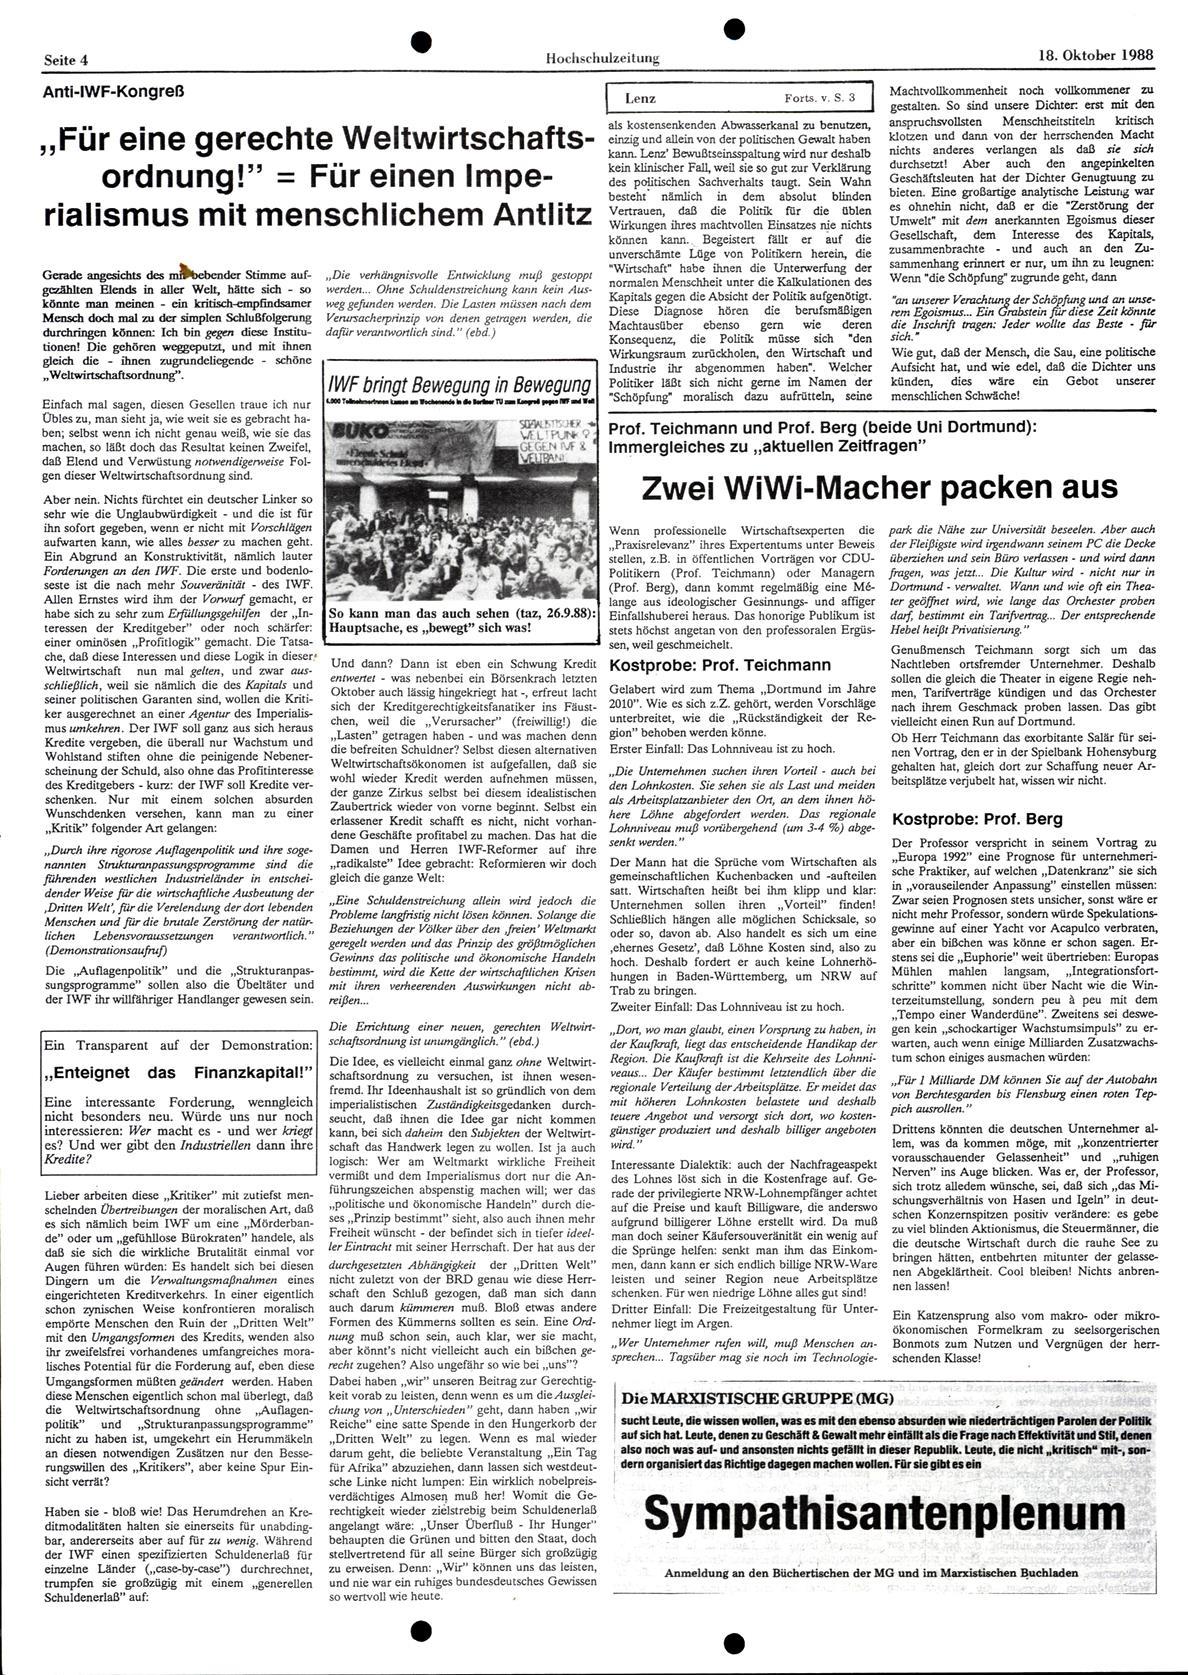 Bochum_BHZ_19881018_179_004